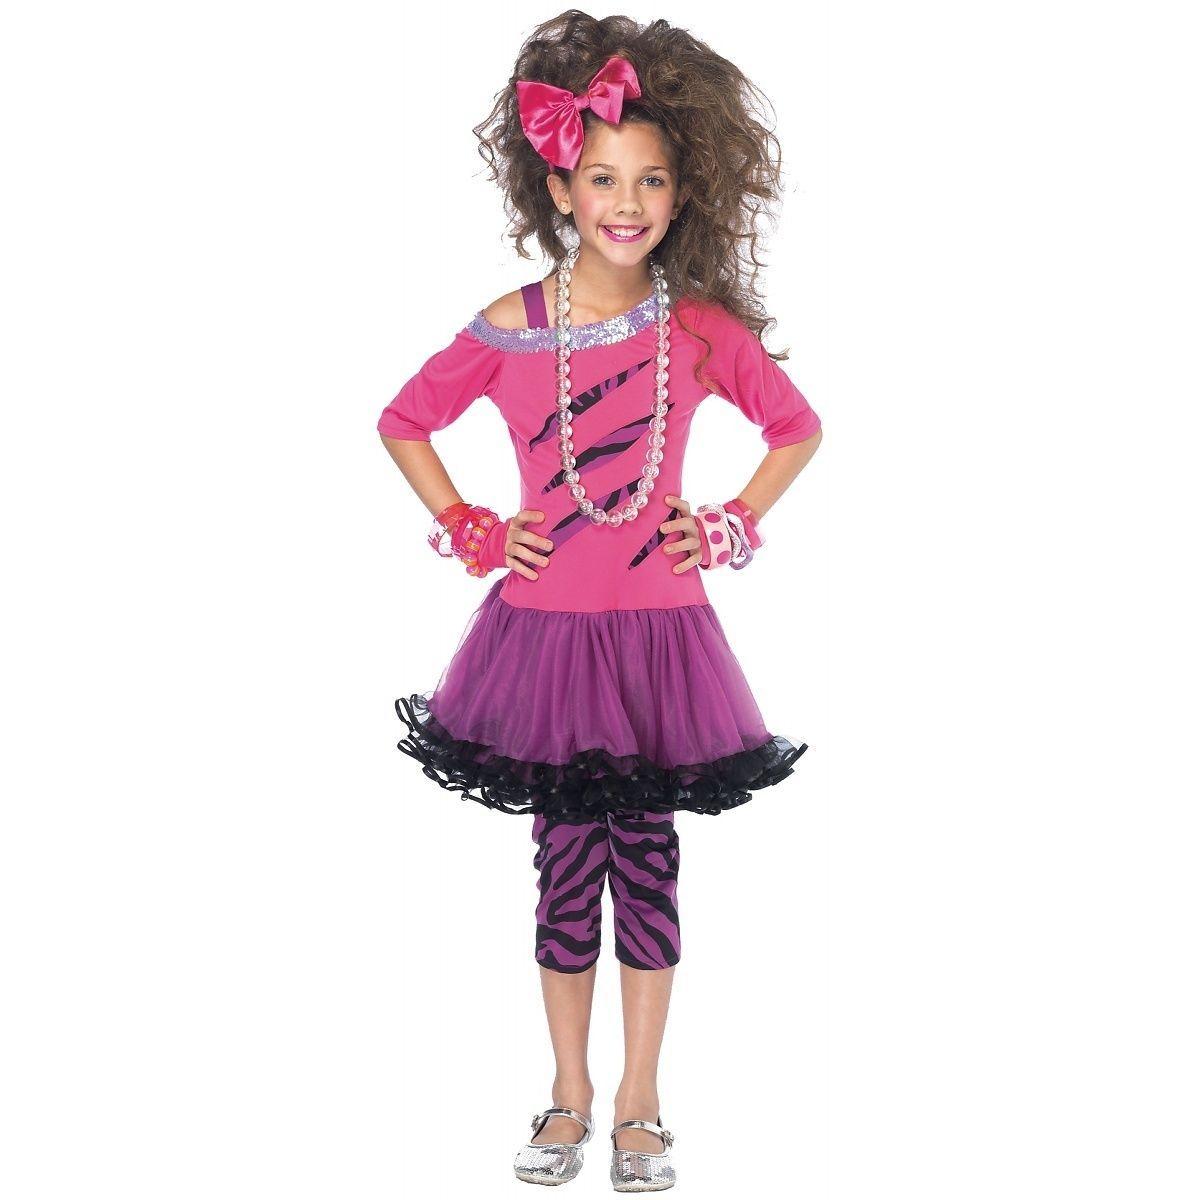 Rockstar Rock Star Pop Diva Costume Halloween Fancy Dress | Fiestas